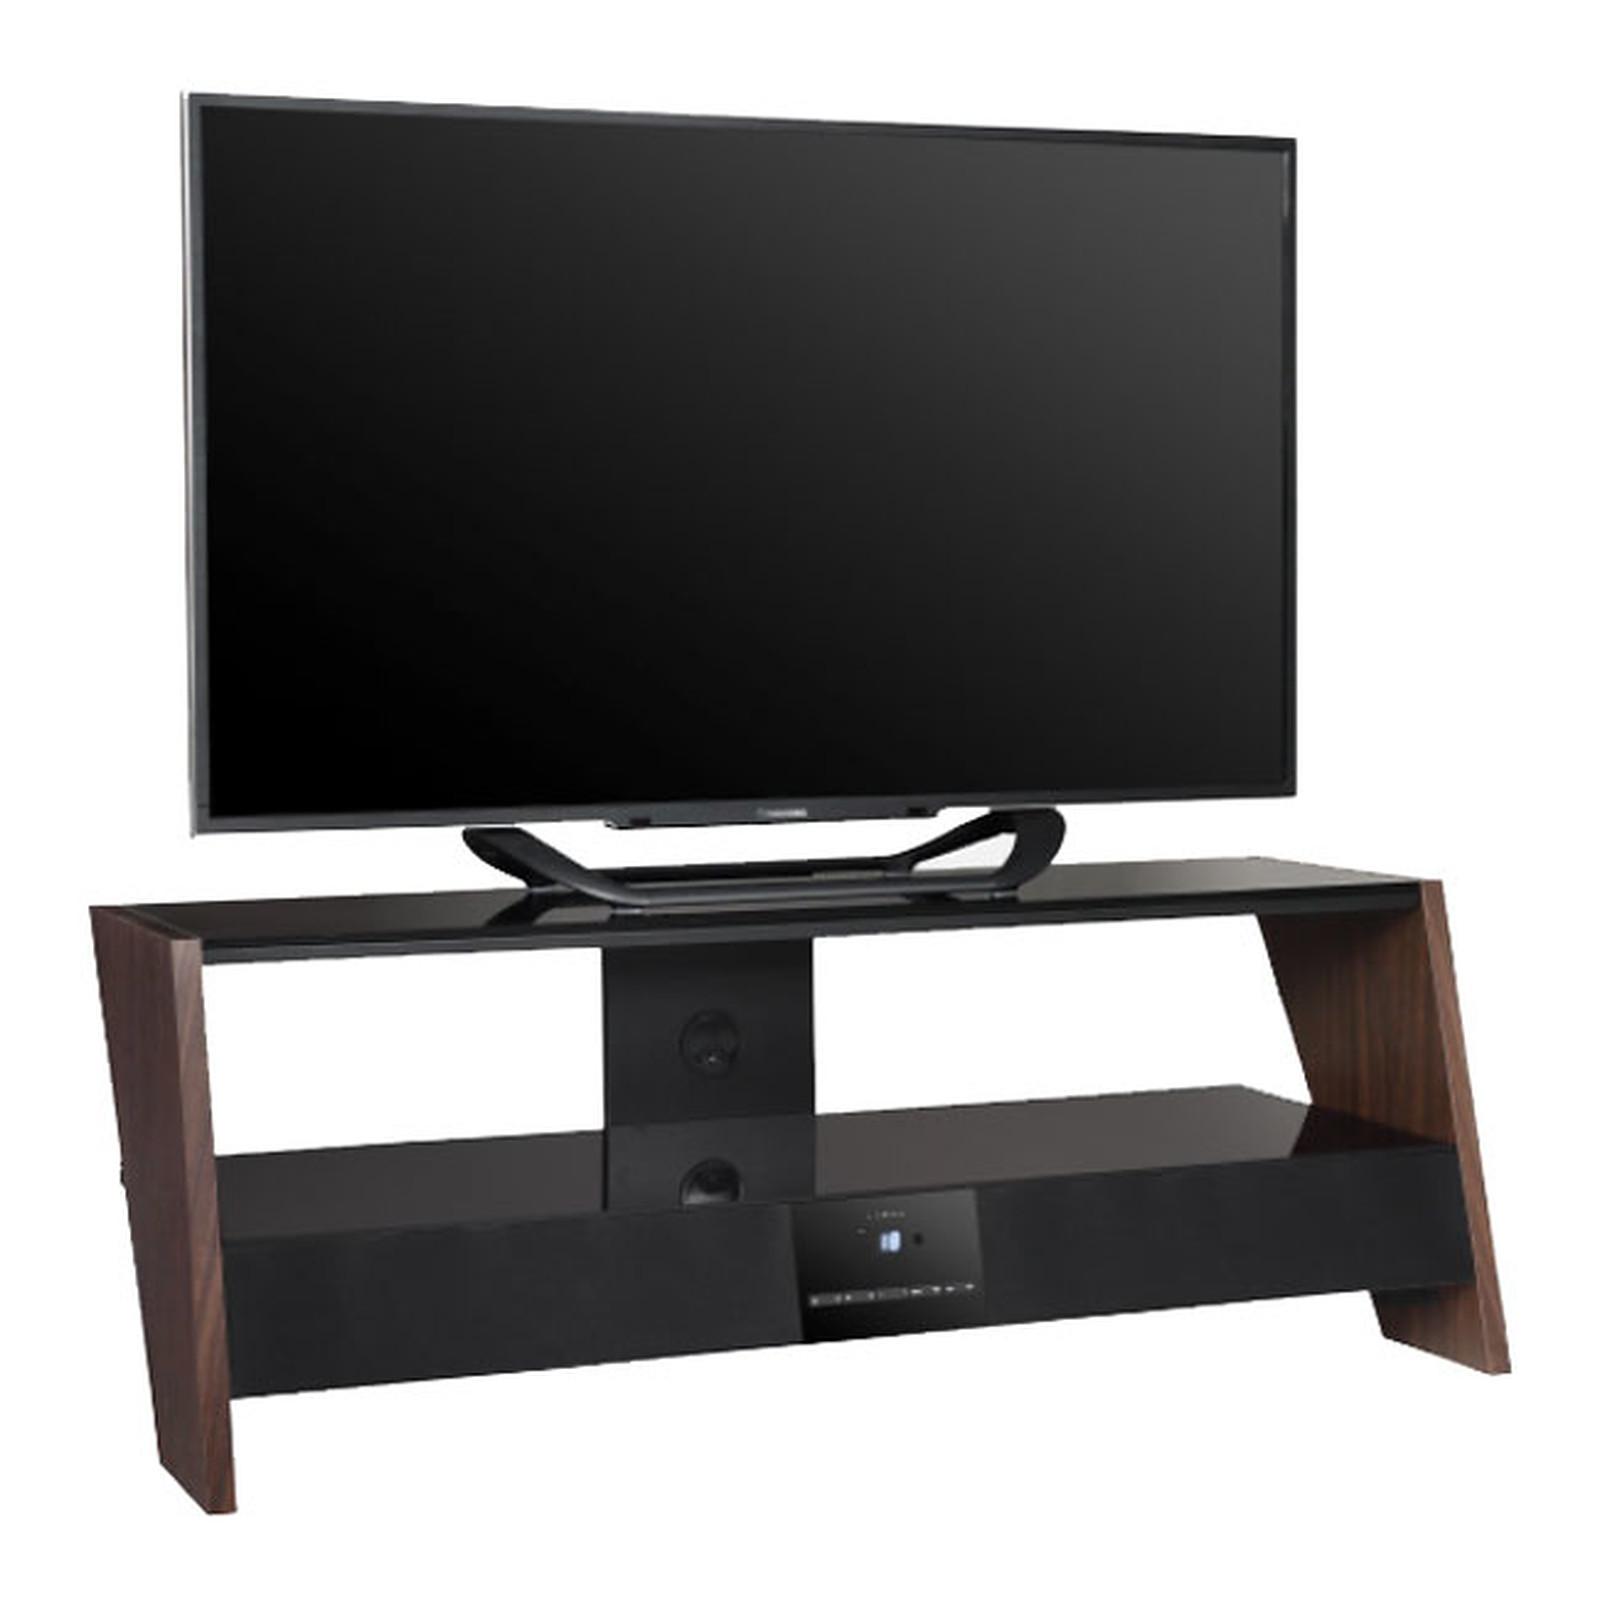 Meuble Tv Hifi Intégré prestige moonlight wood - meuble tv prestige sur ldlc